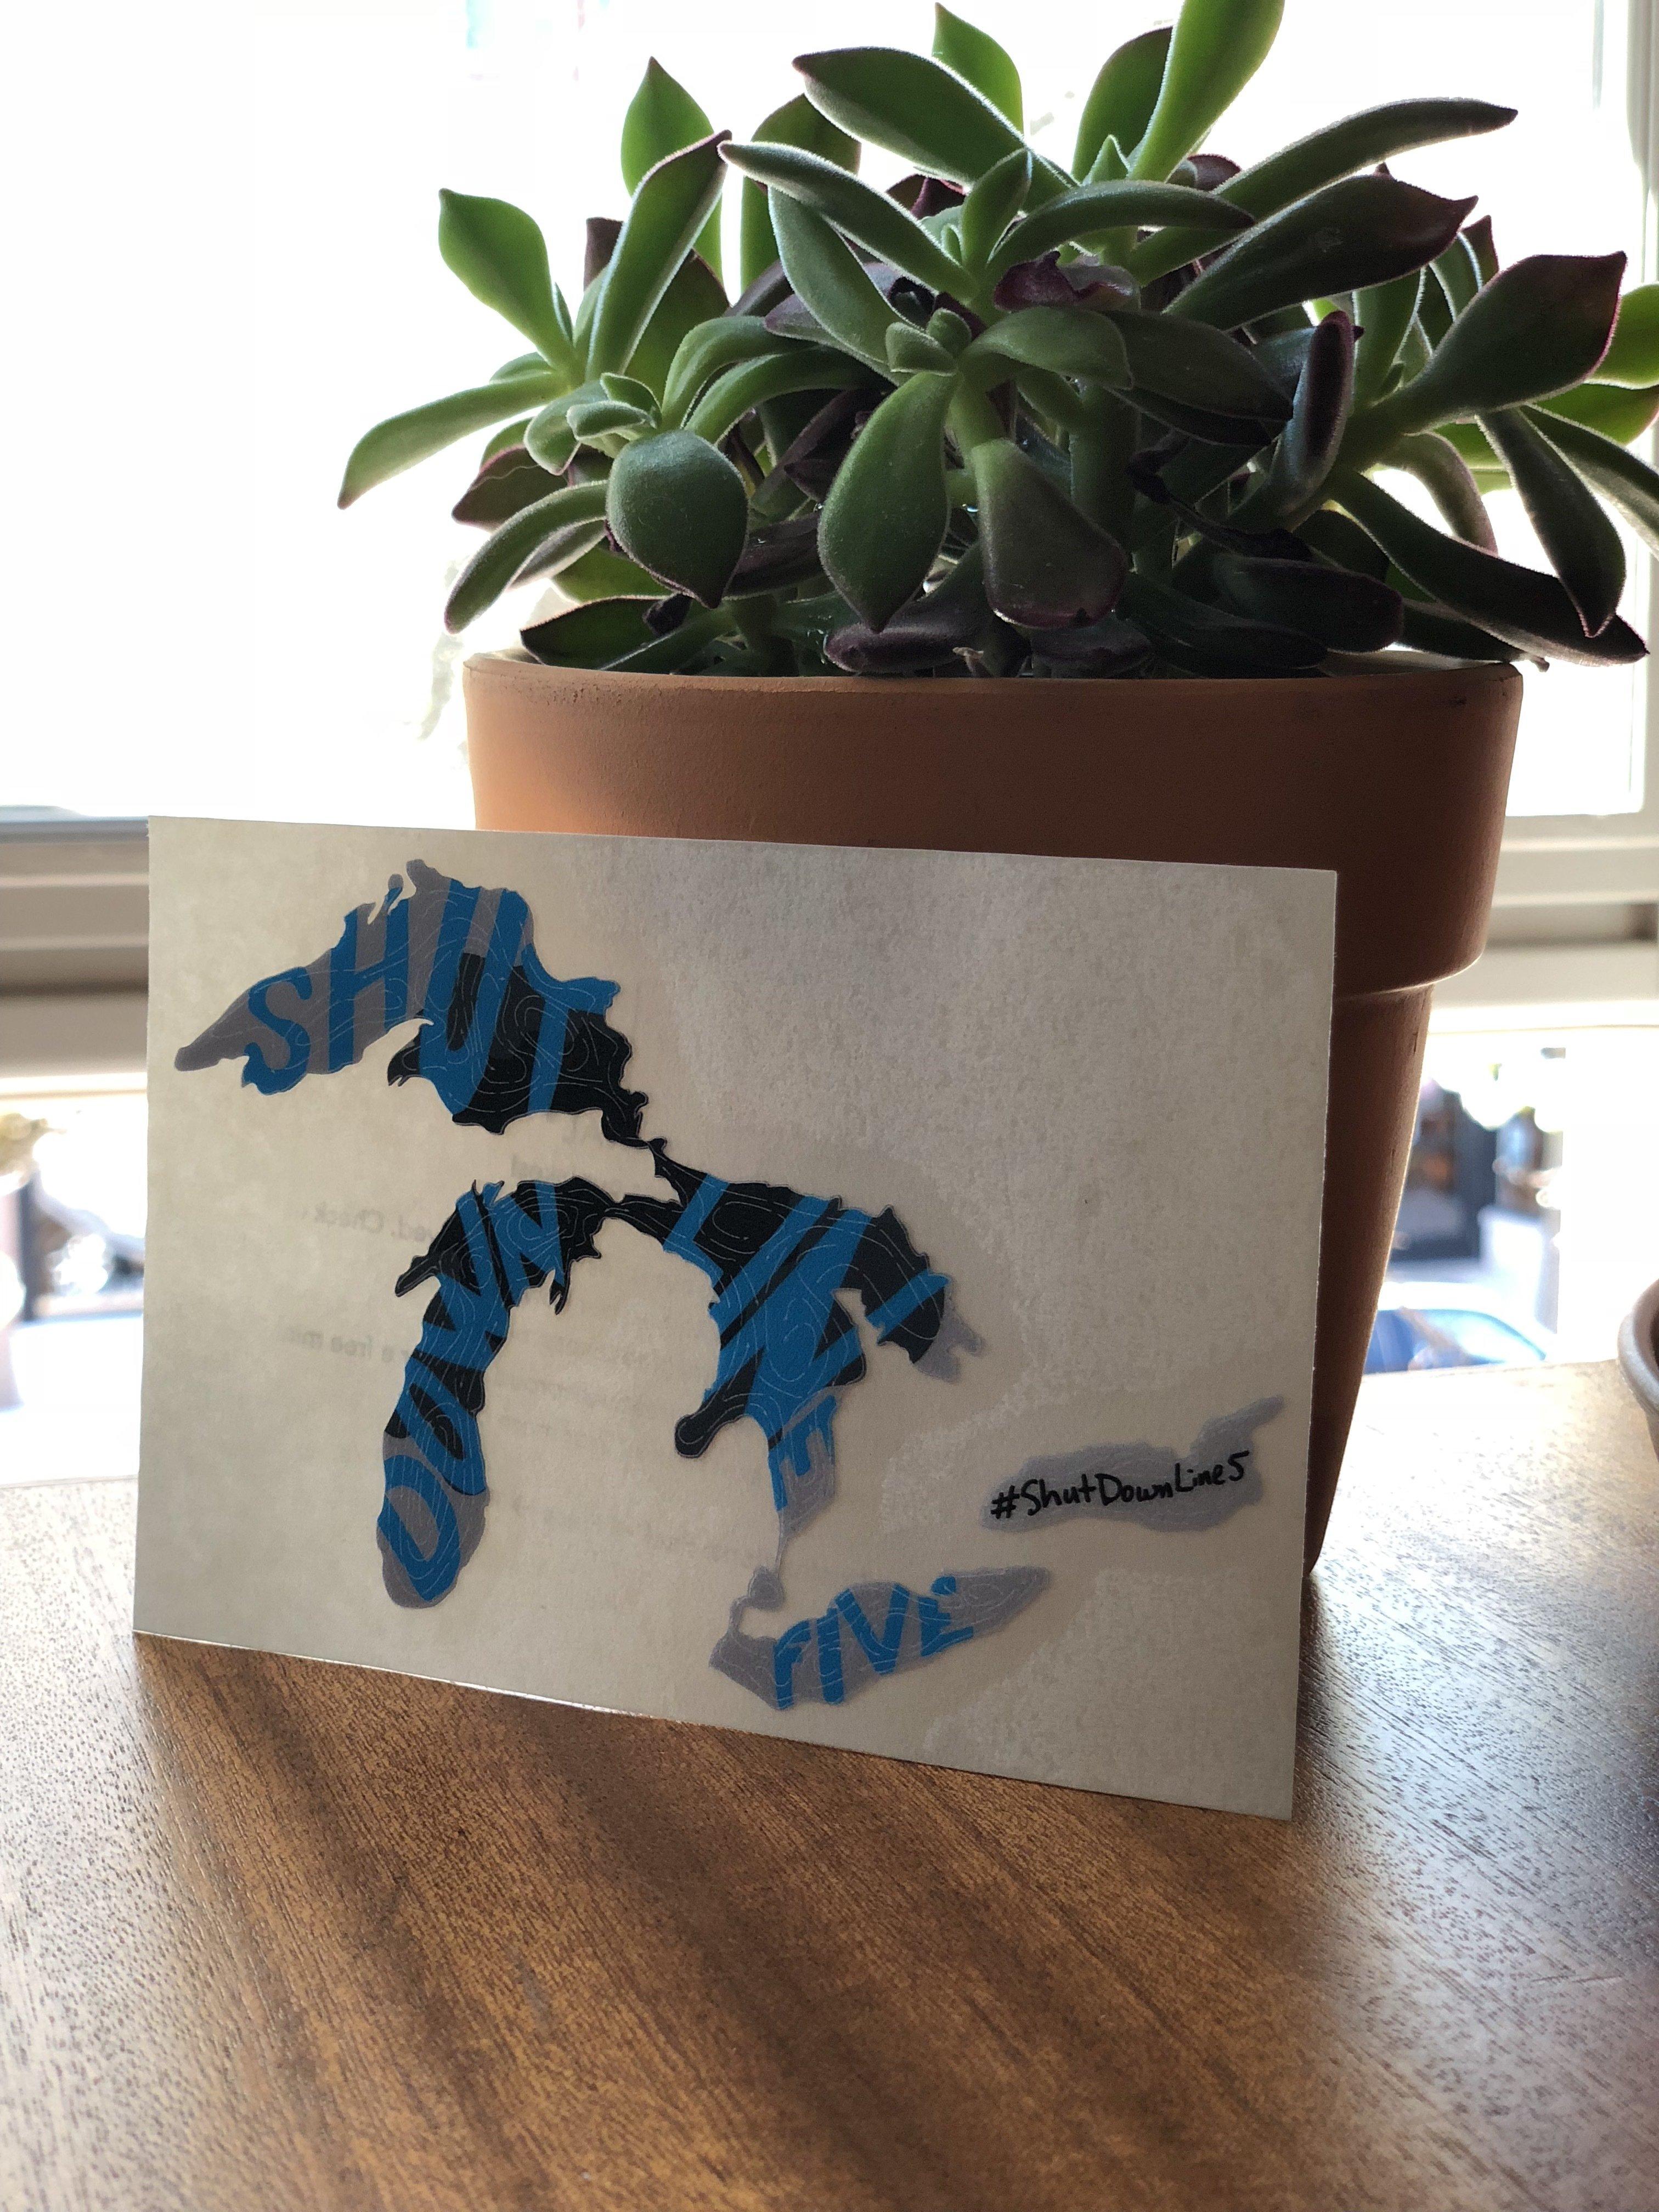 Great Lakes Proud - Shut Down Line 5 Sticker